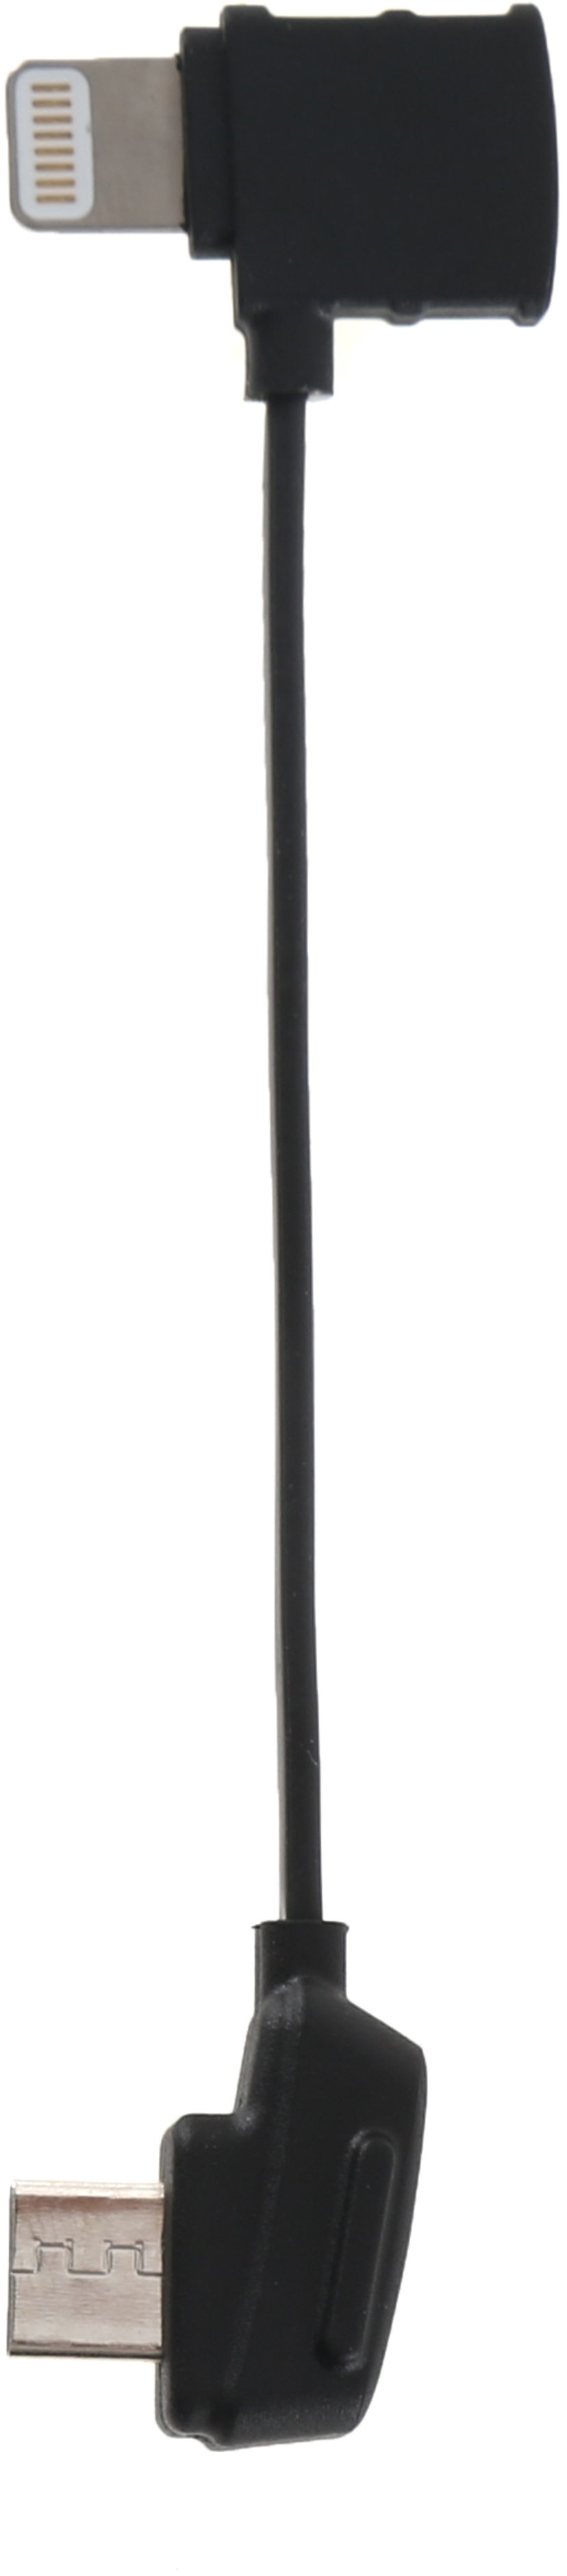 DJI Lightning cable